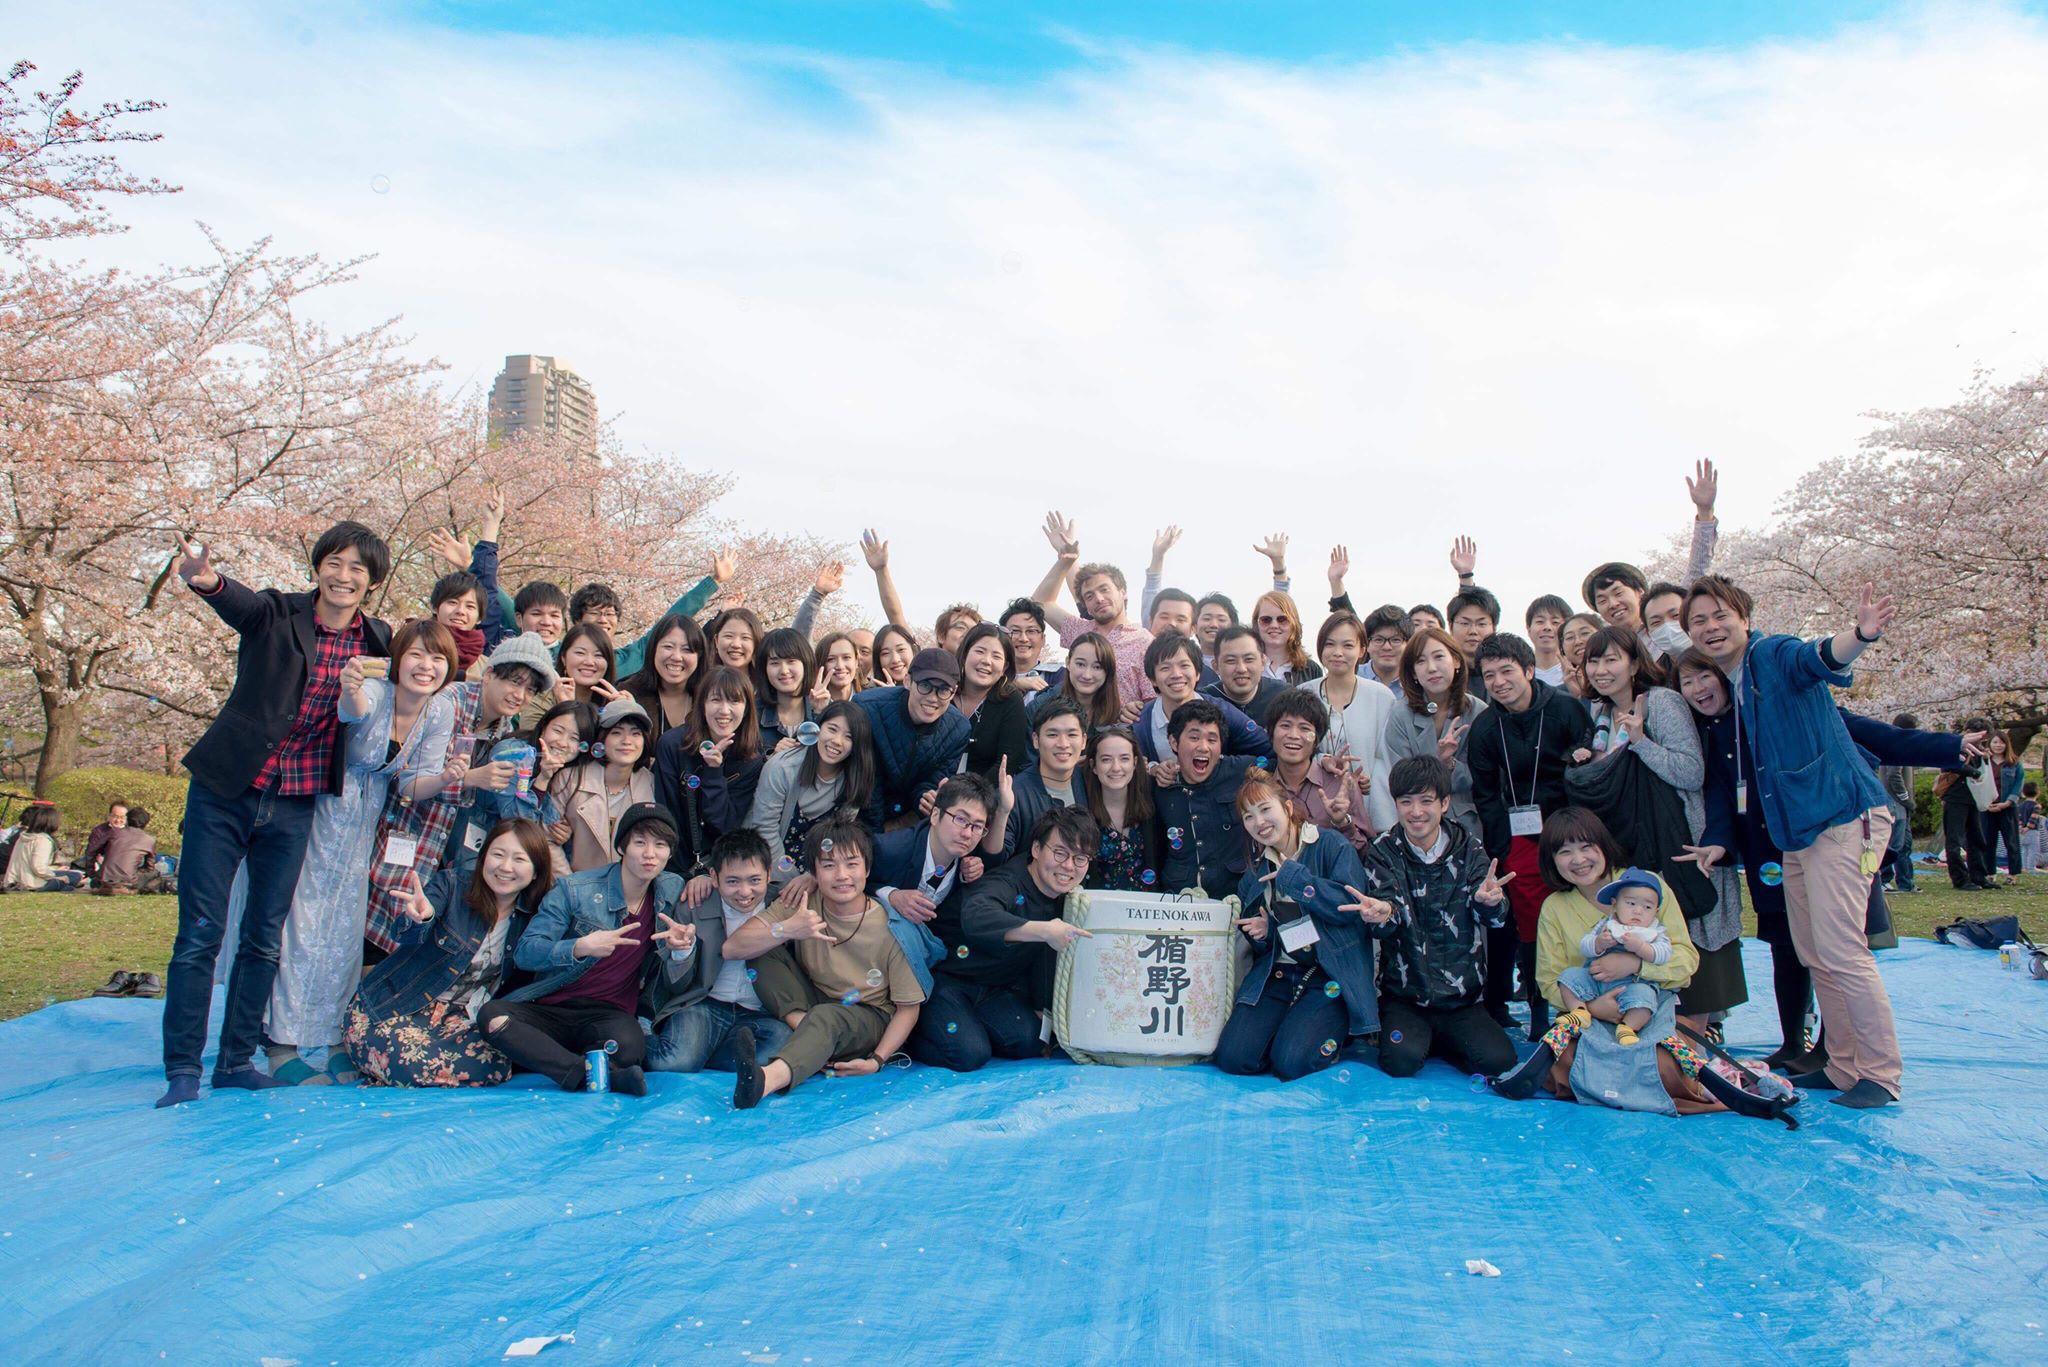 (JP) 合同お花見イベント2018〜日本酒と桜と音楽と〜